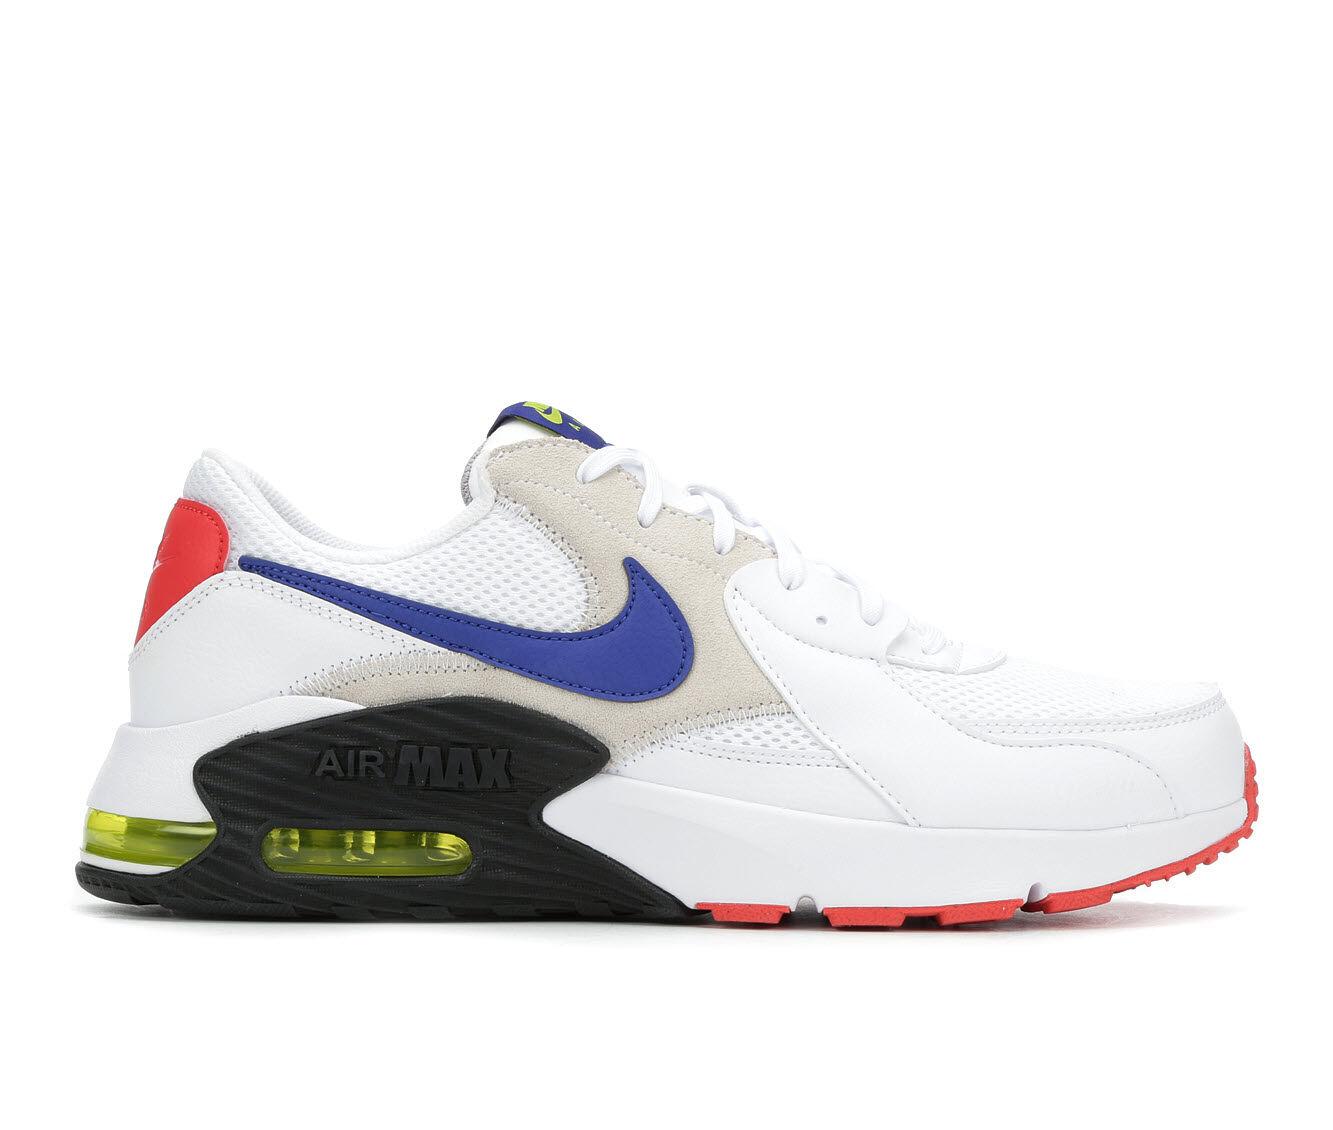 Men's Athletic Shoes & Sneakers | Tennis & Gym Shoes | Shoe